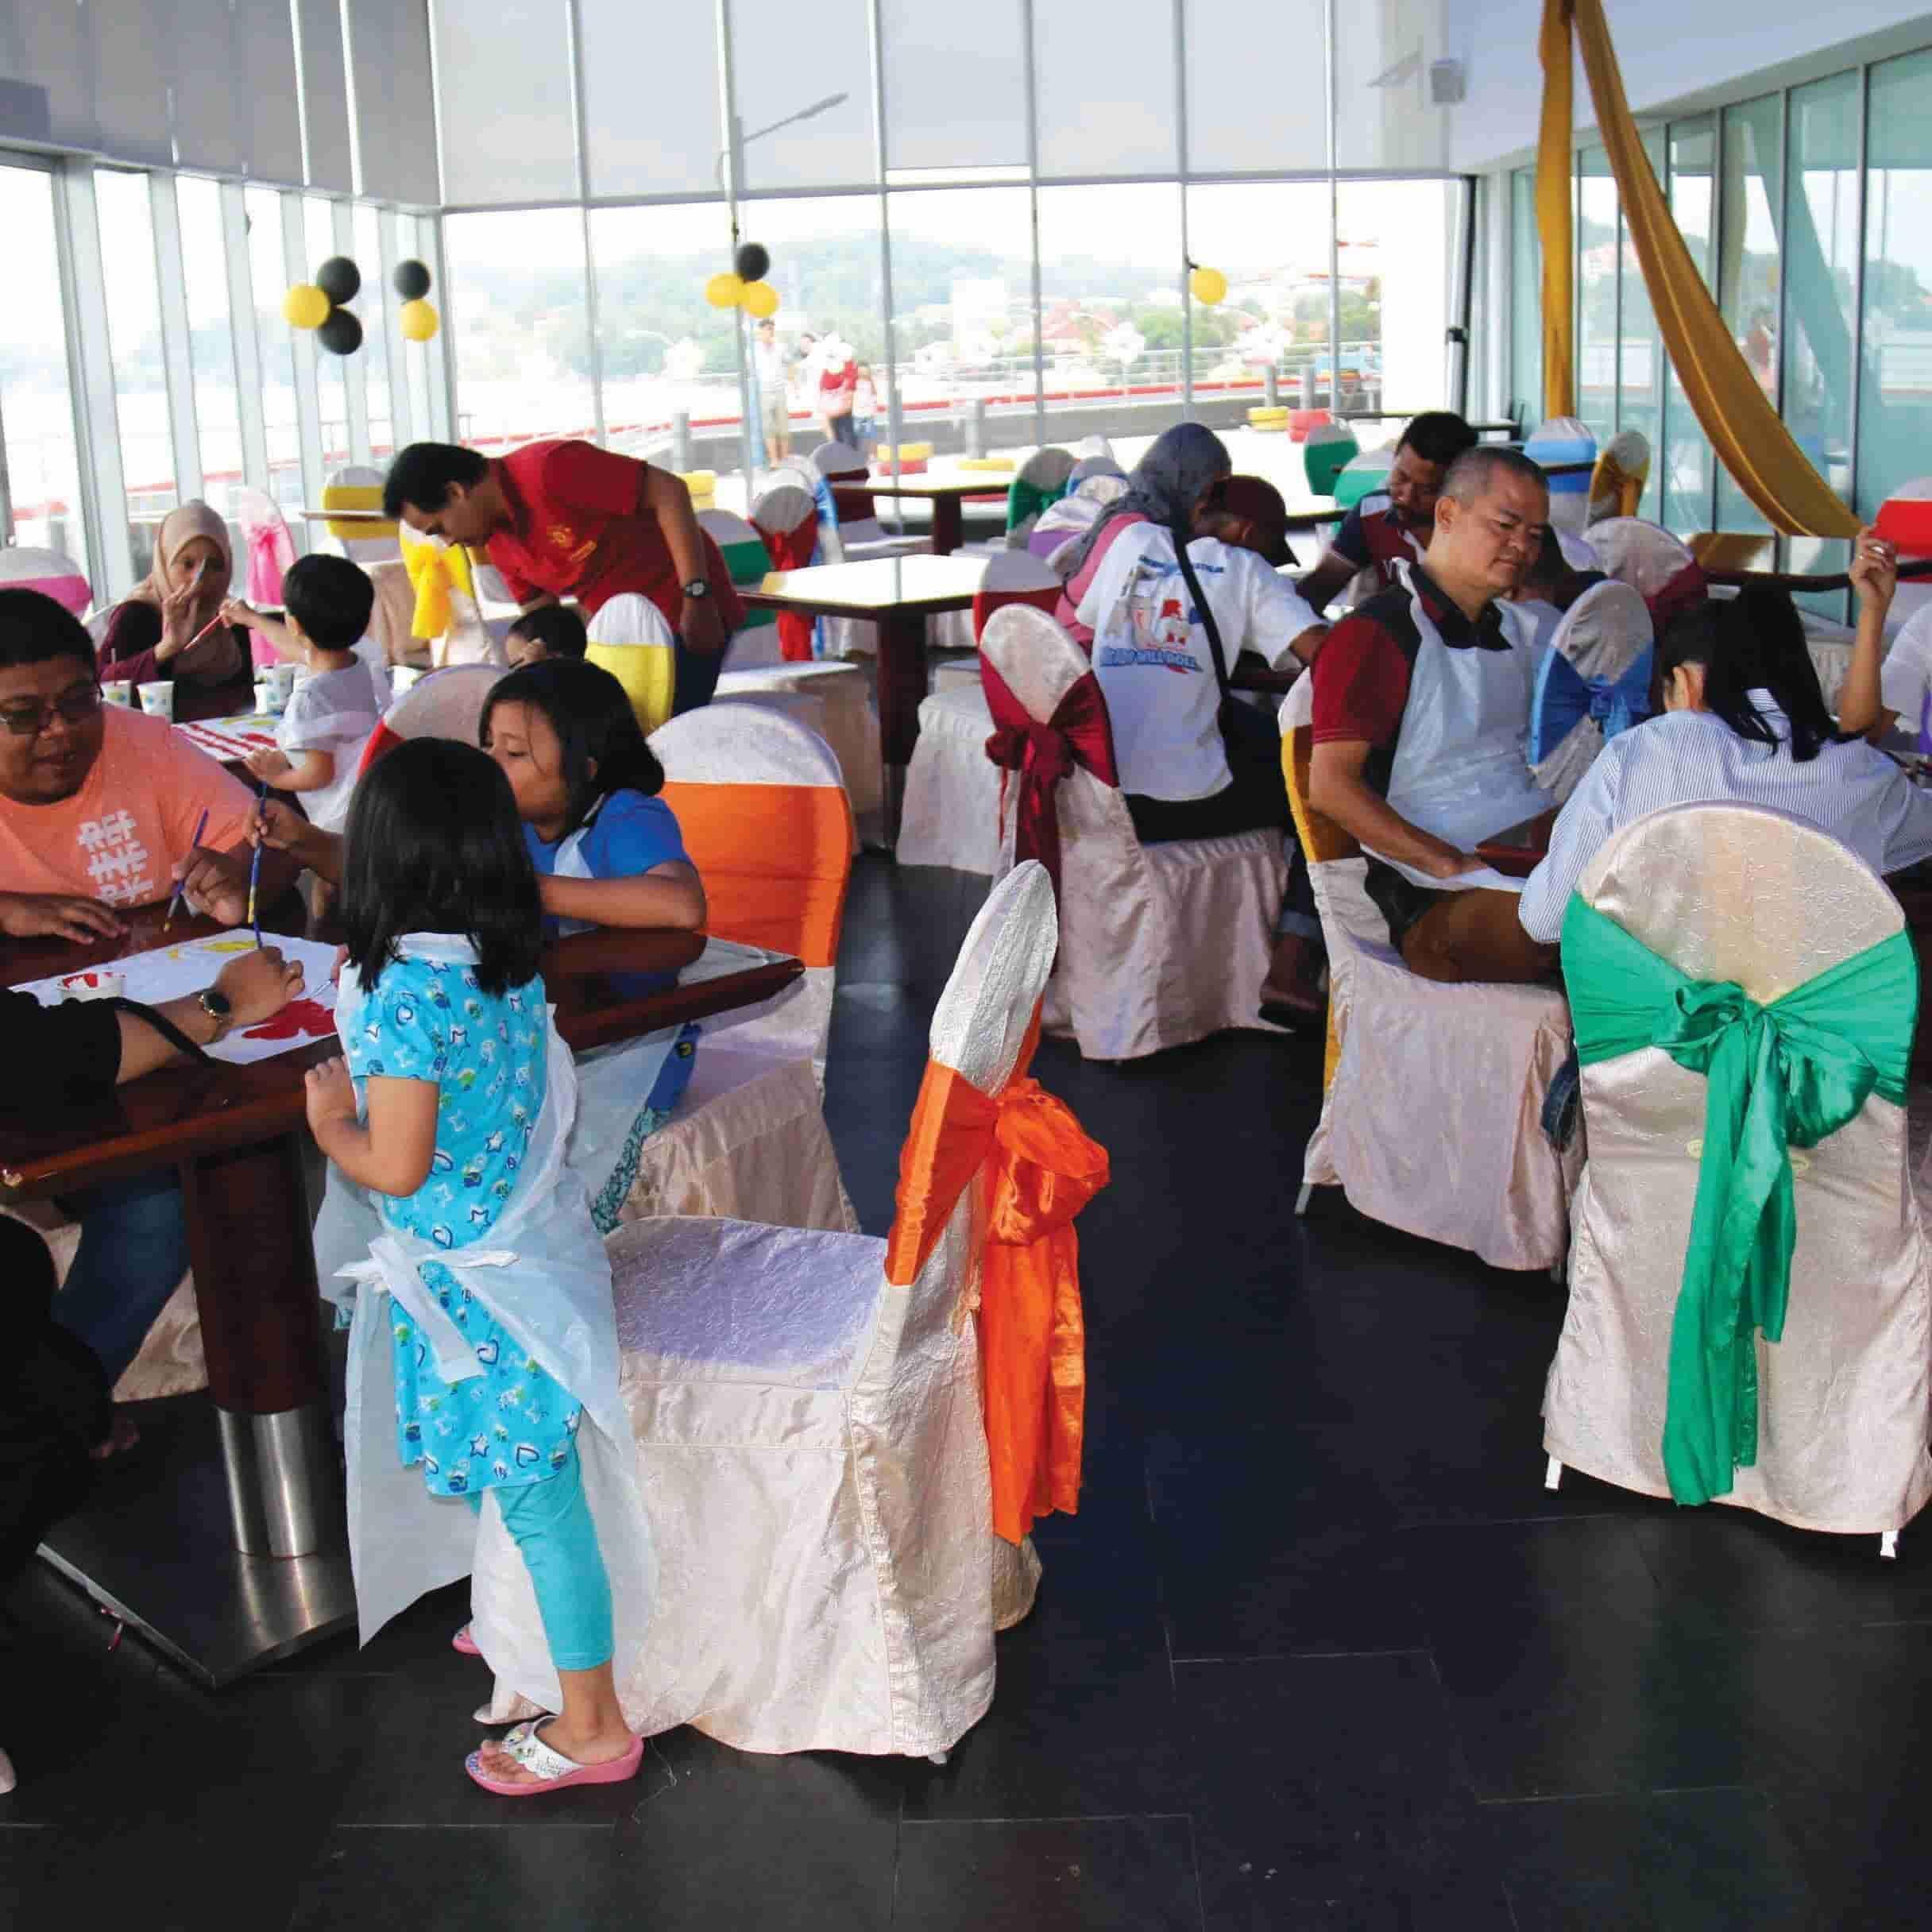 News 2018 - Merdeka Family Fun Activities | Lexis Hibiscus® Port Dickson